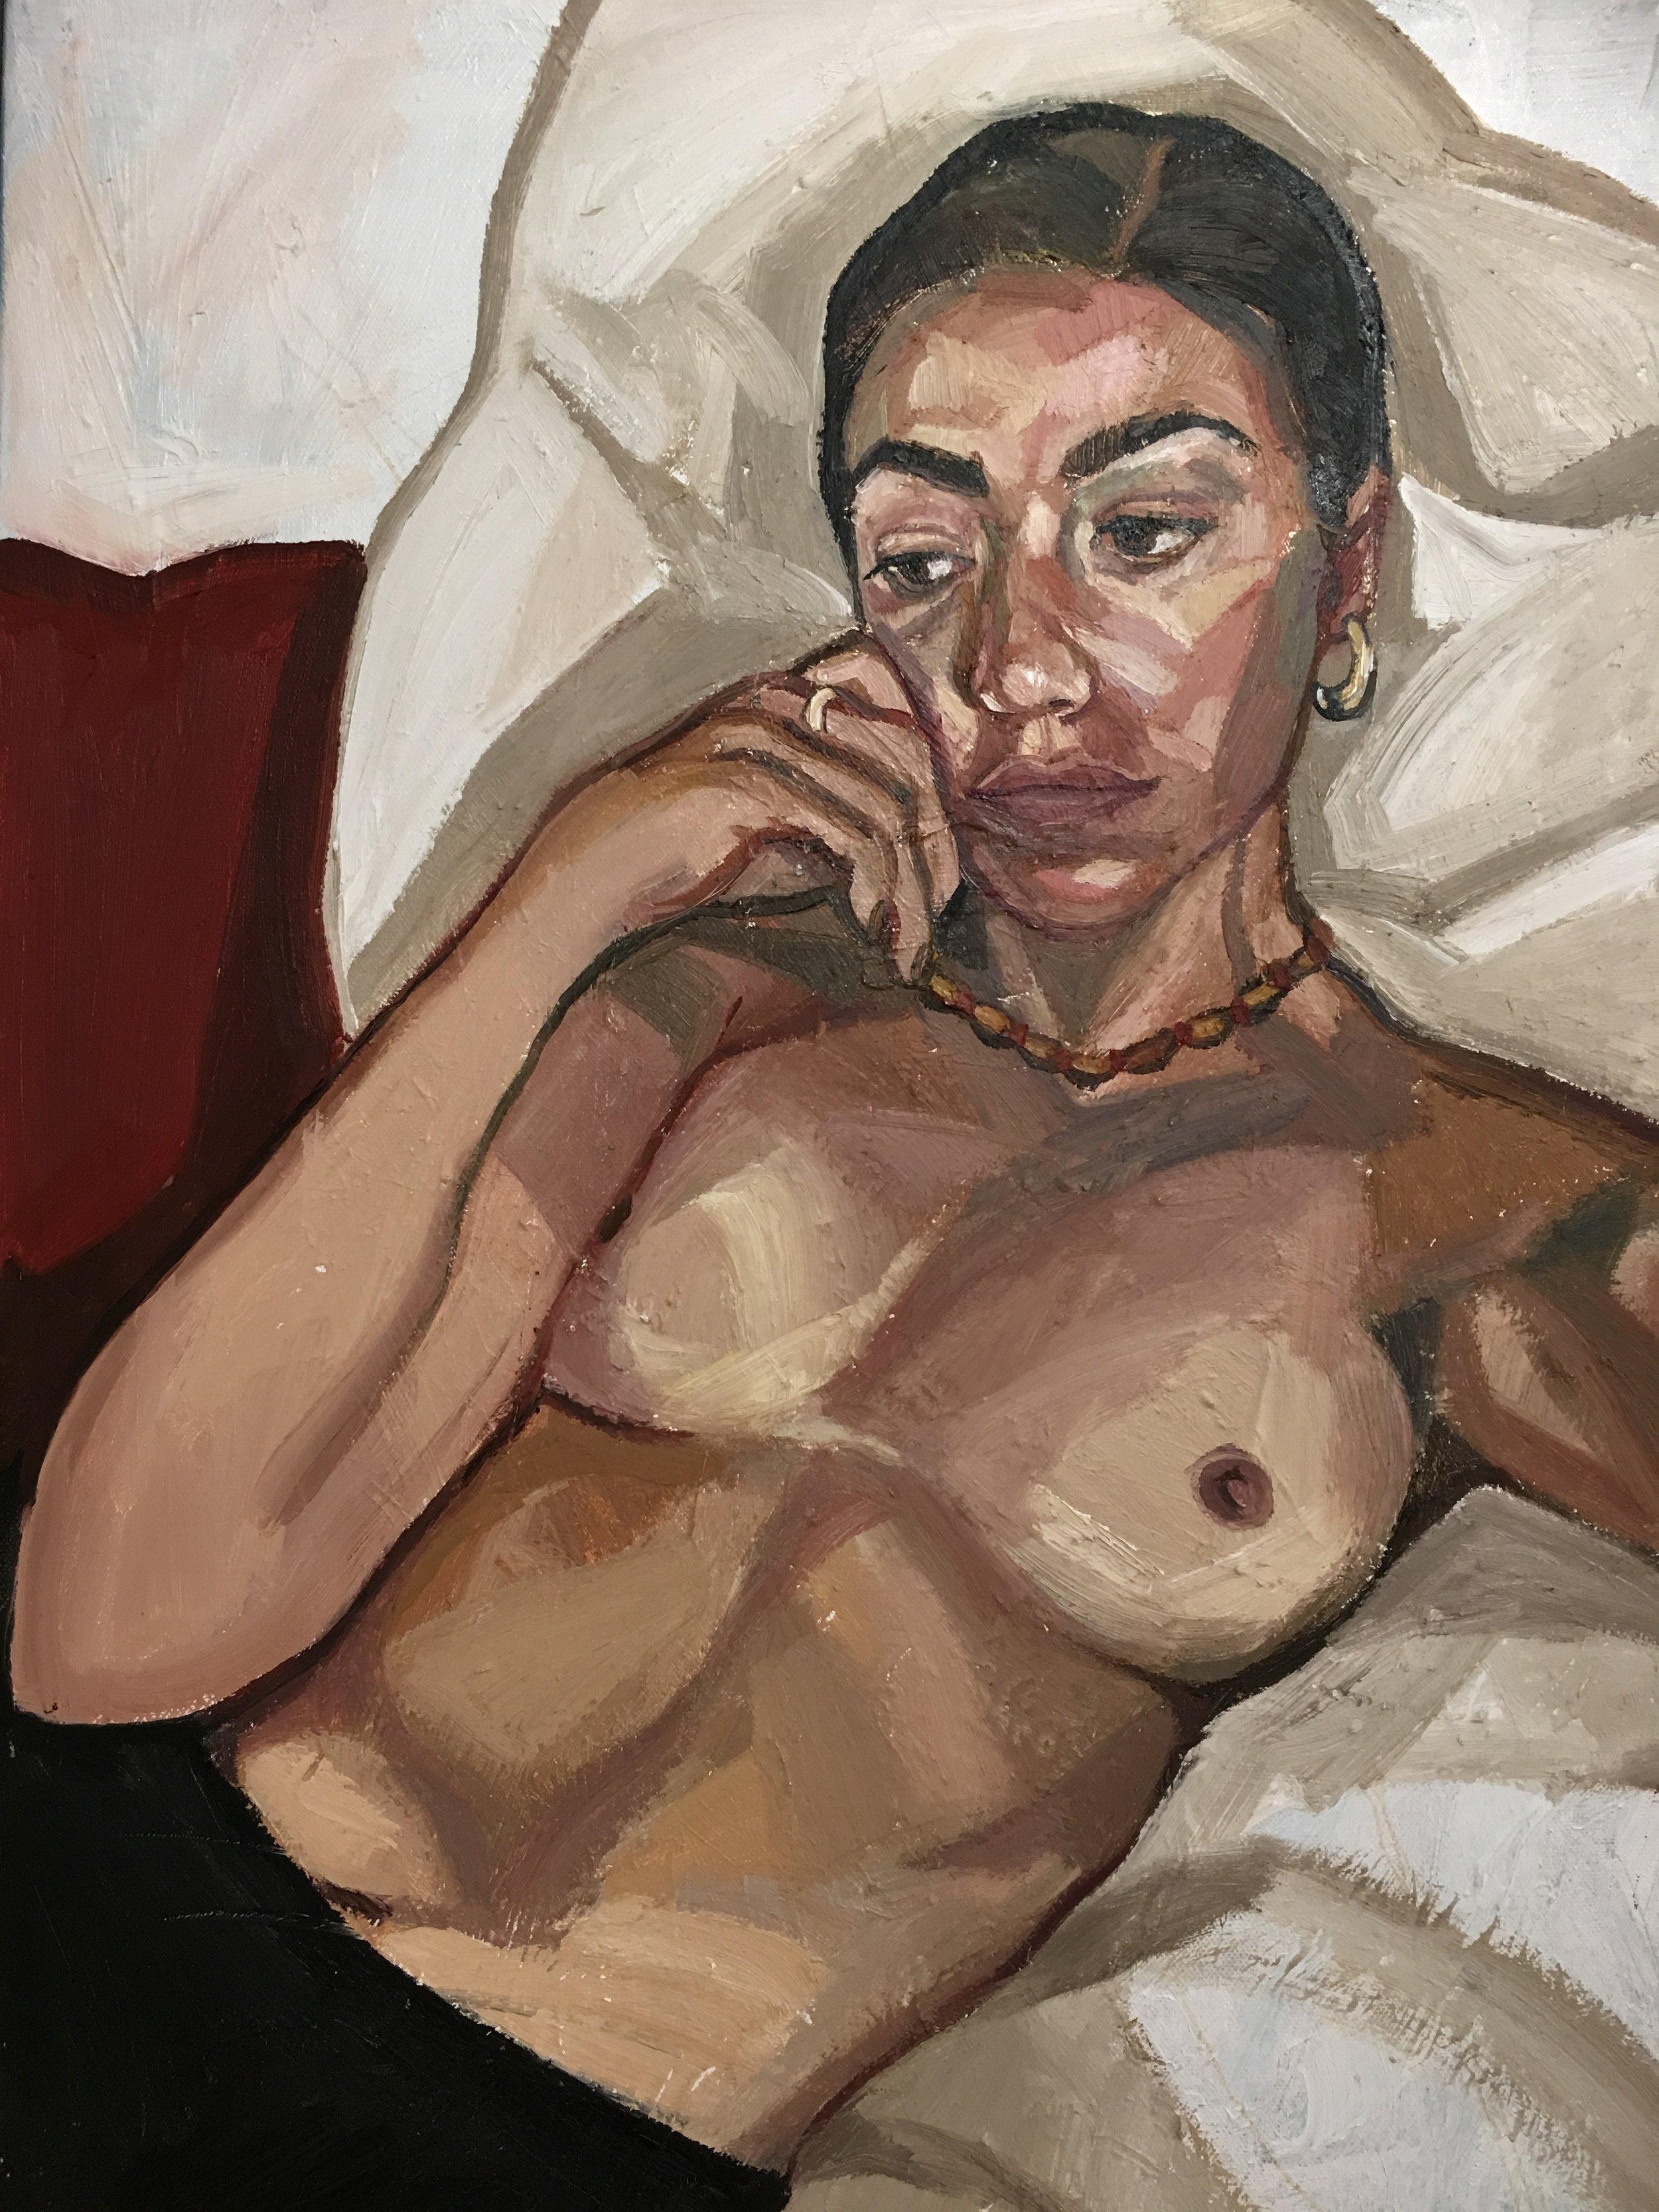 Nude, 2017 | Oil on canvas |81 x 61 cm |£900